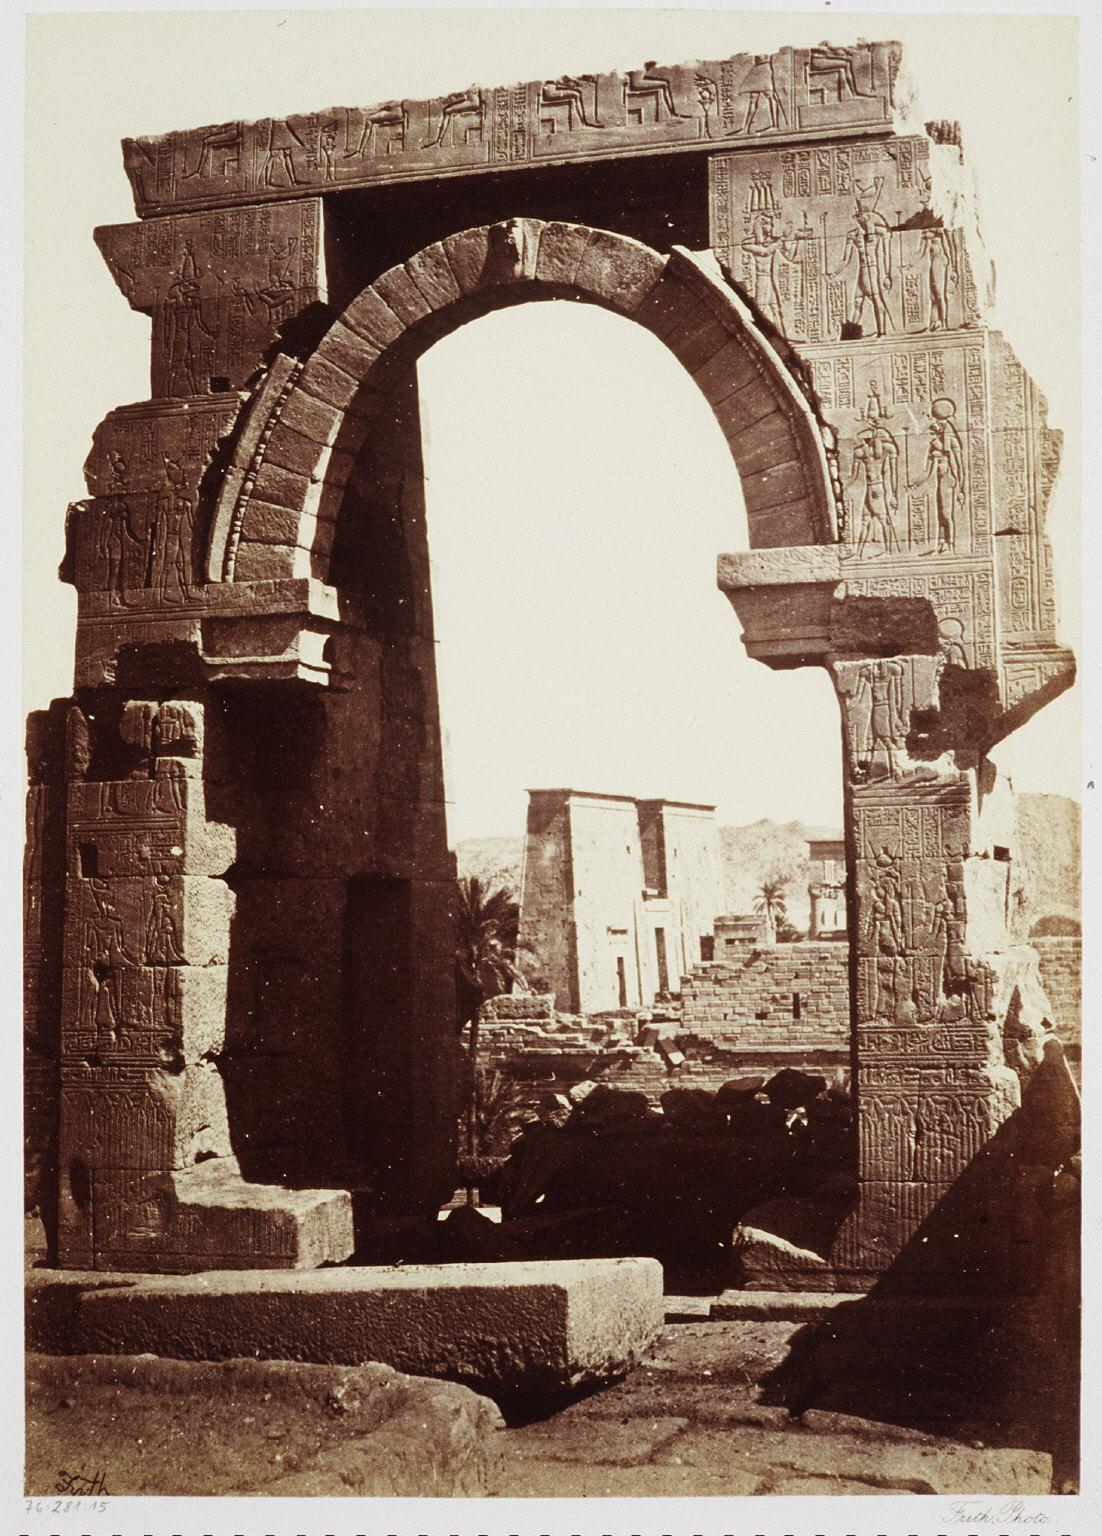 Roman Arch on the Island of Biggeh, Nubia